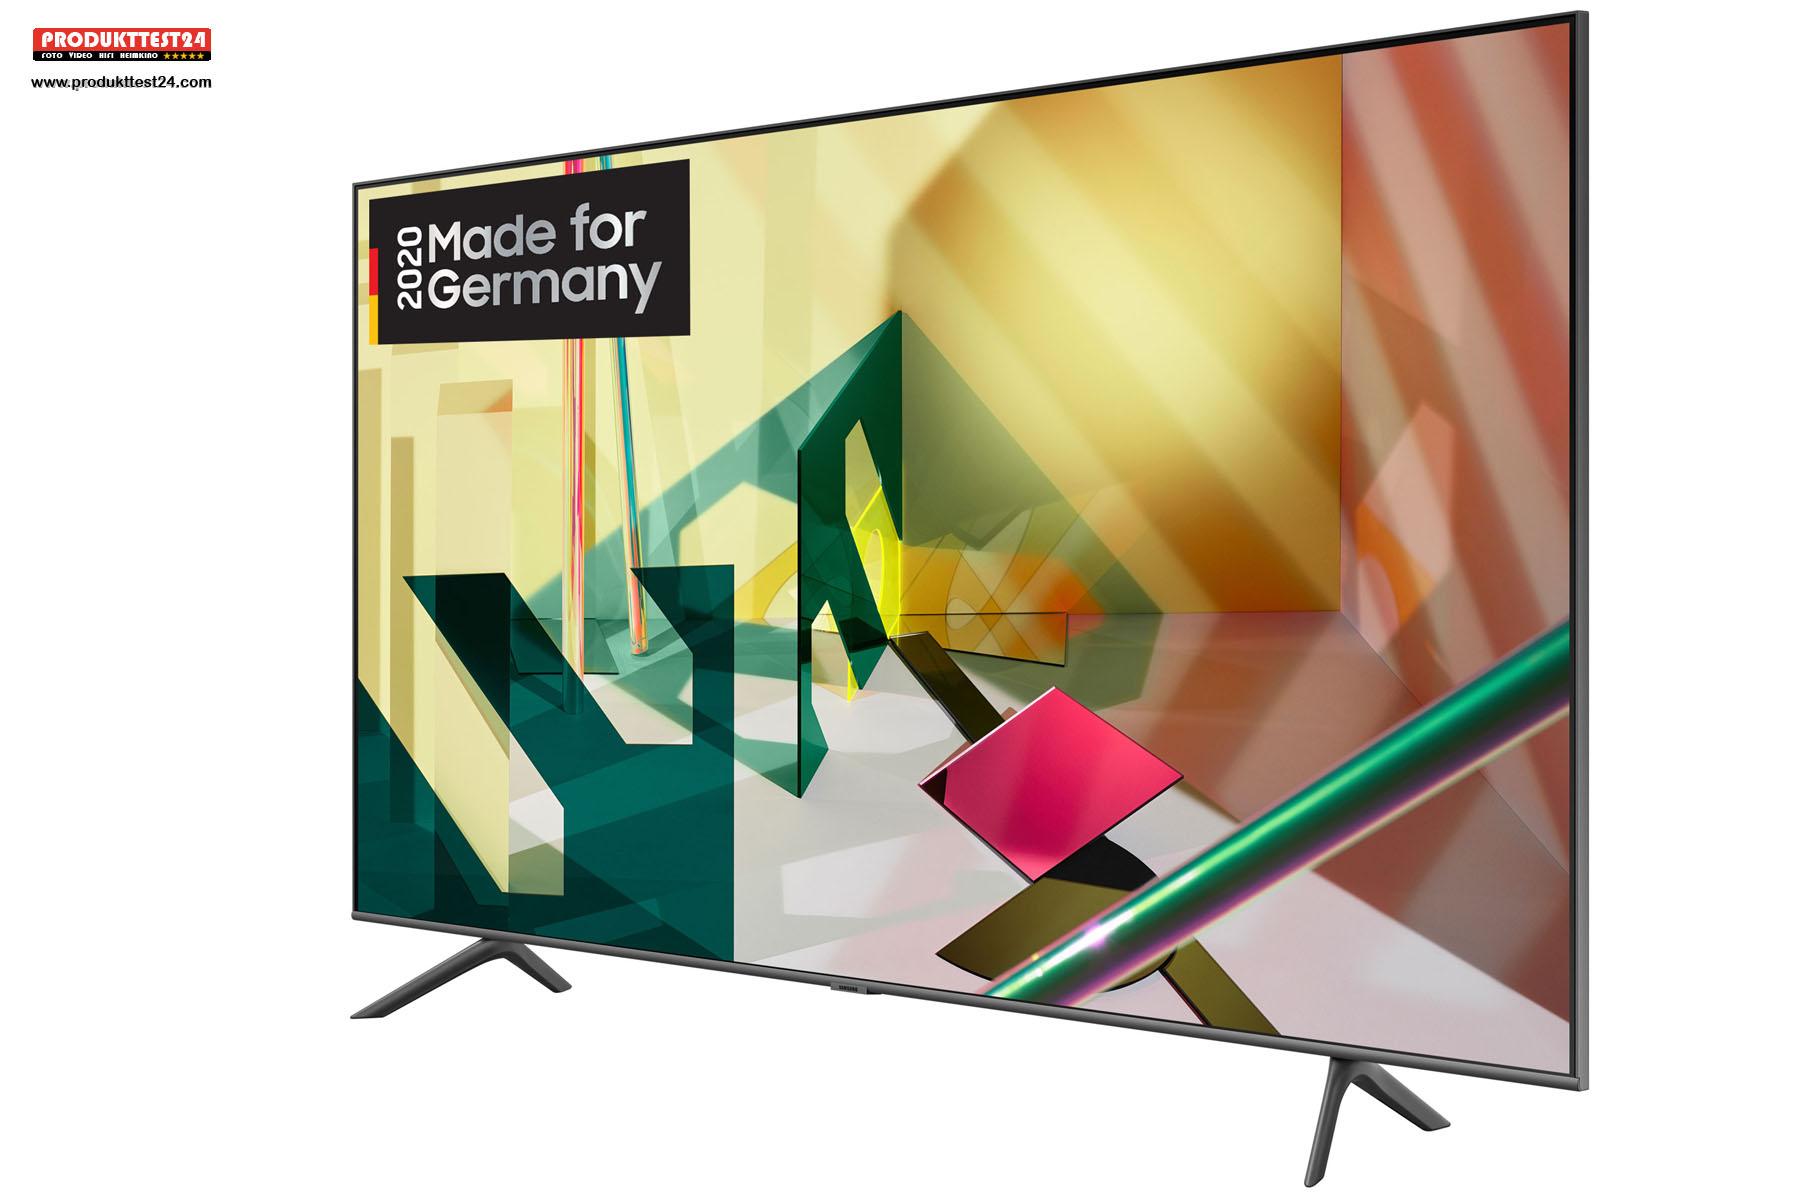 Samsung GQ85Q70T QLED 4K-Fernseher